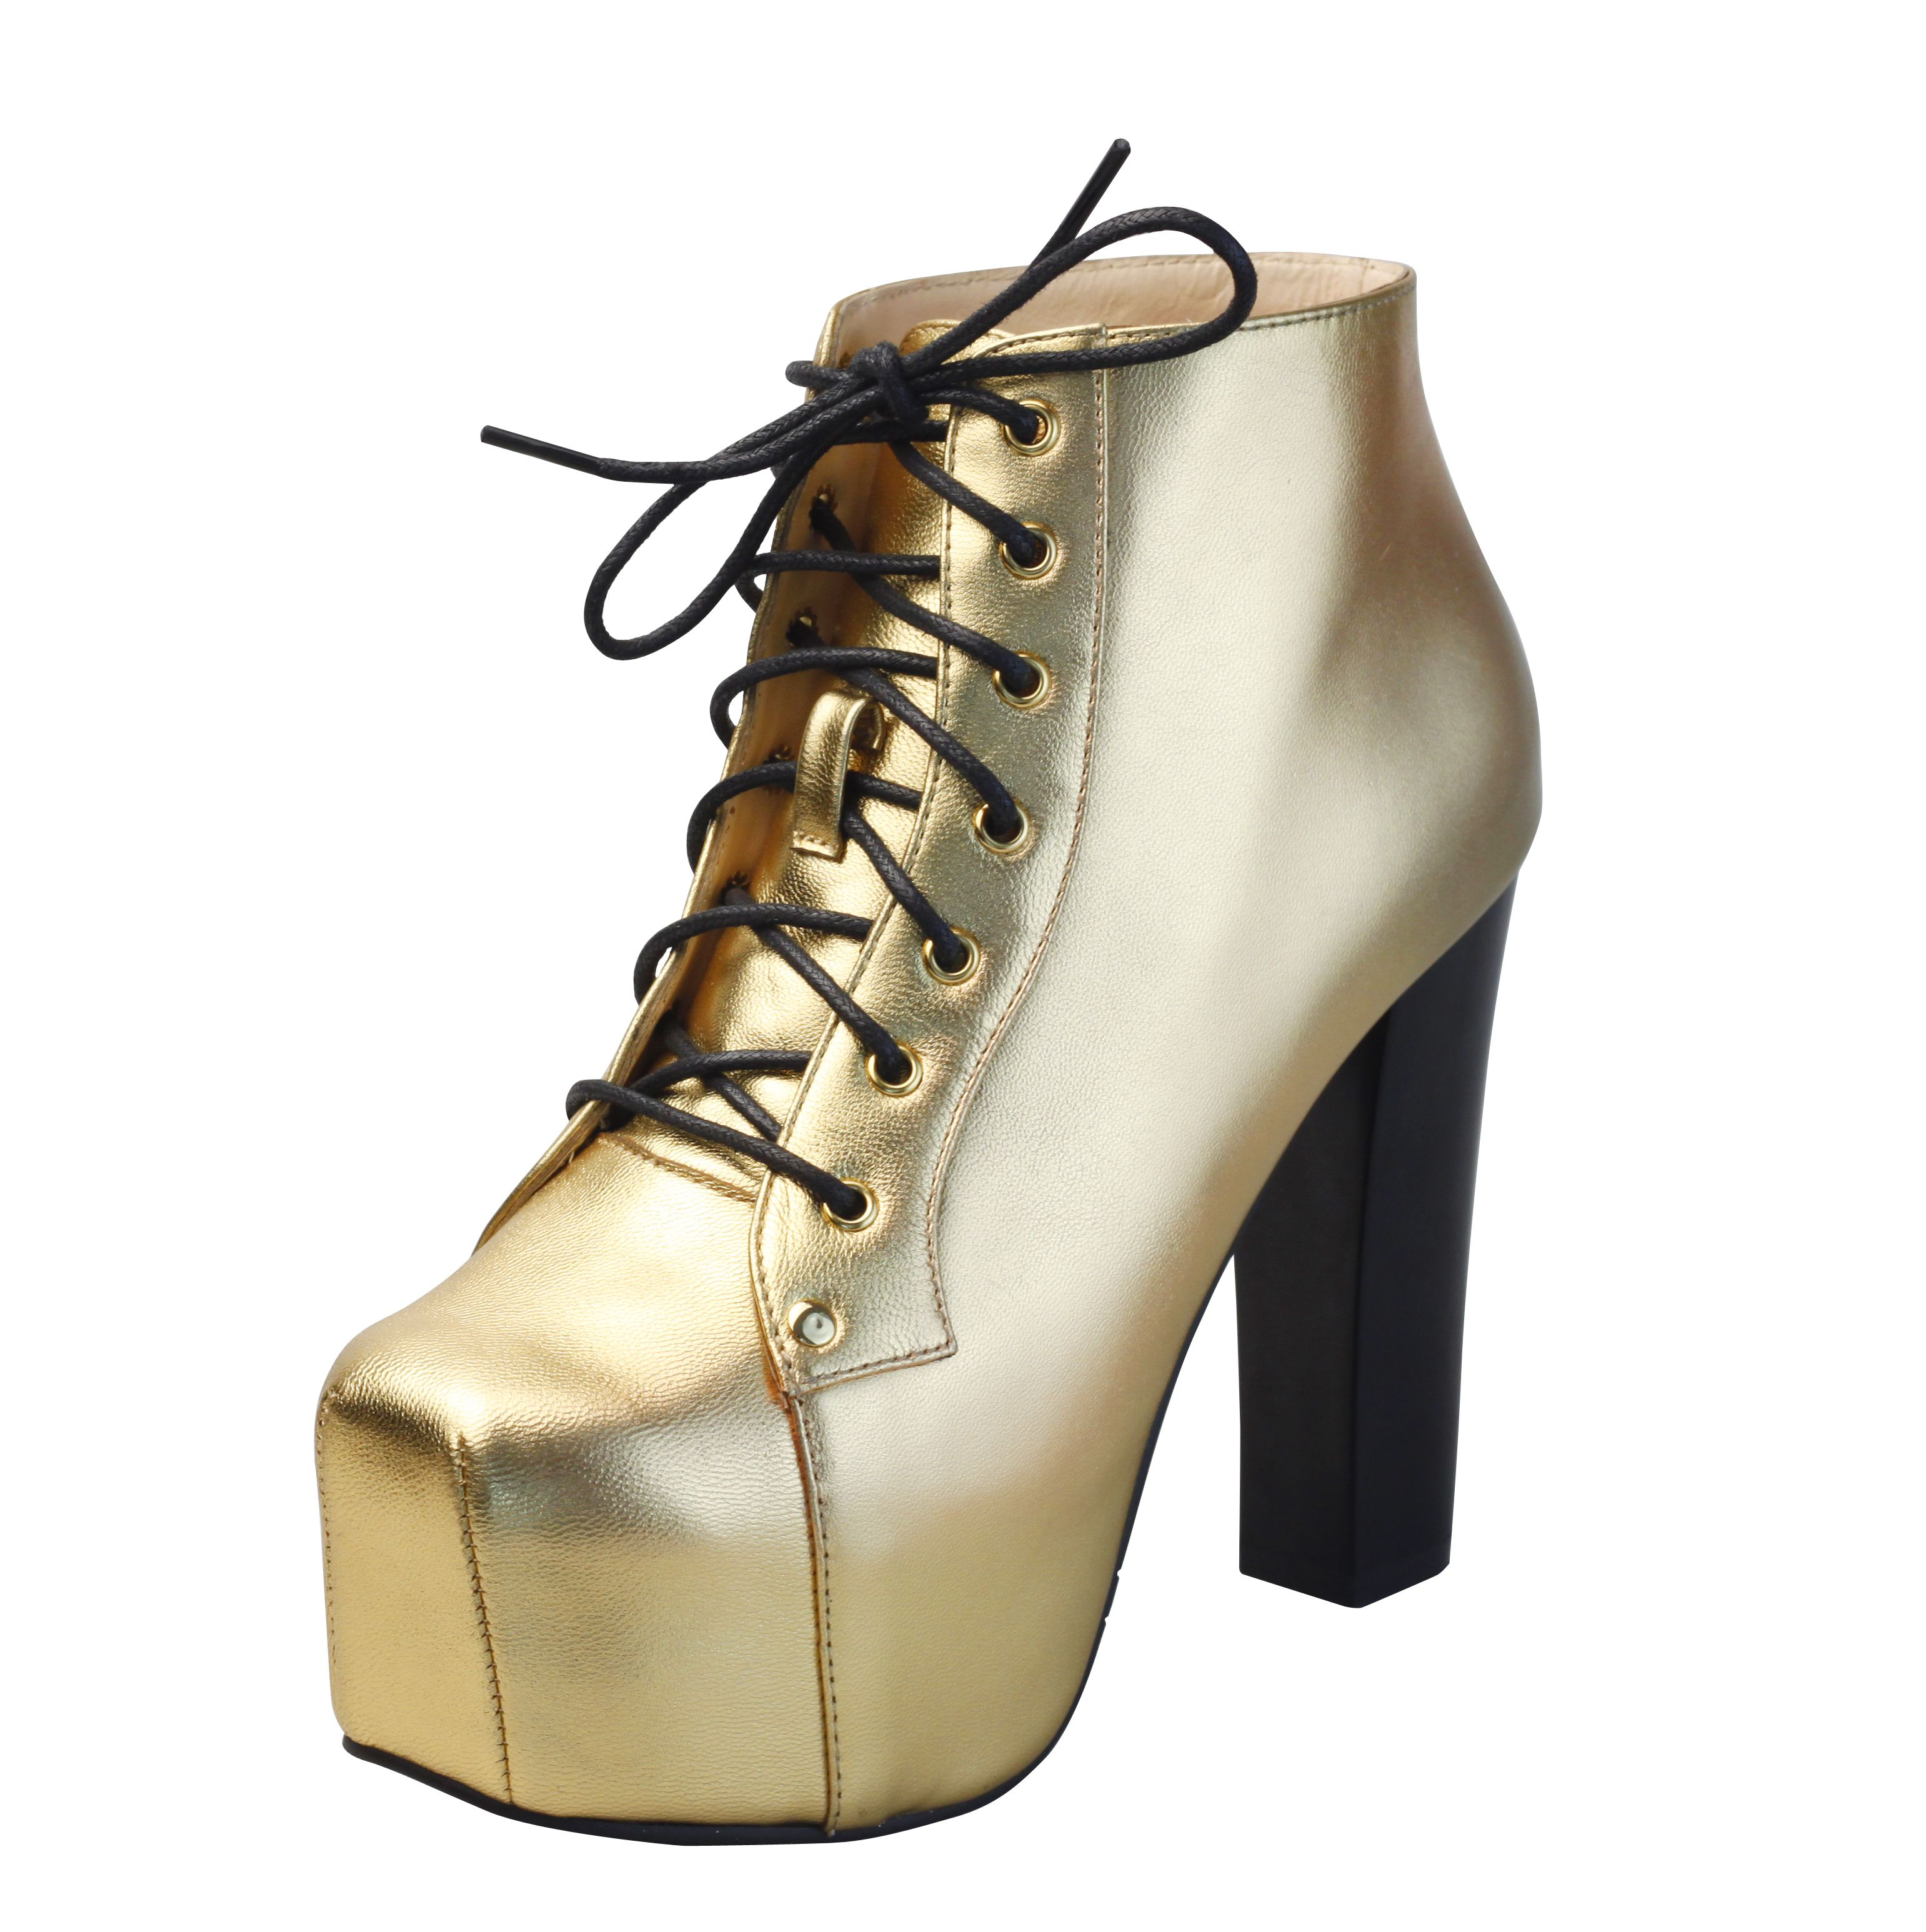 comforter antimasyon short wear black booties how for ankle boots heels wedge to bootie comfortable walking